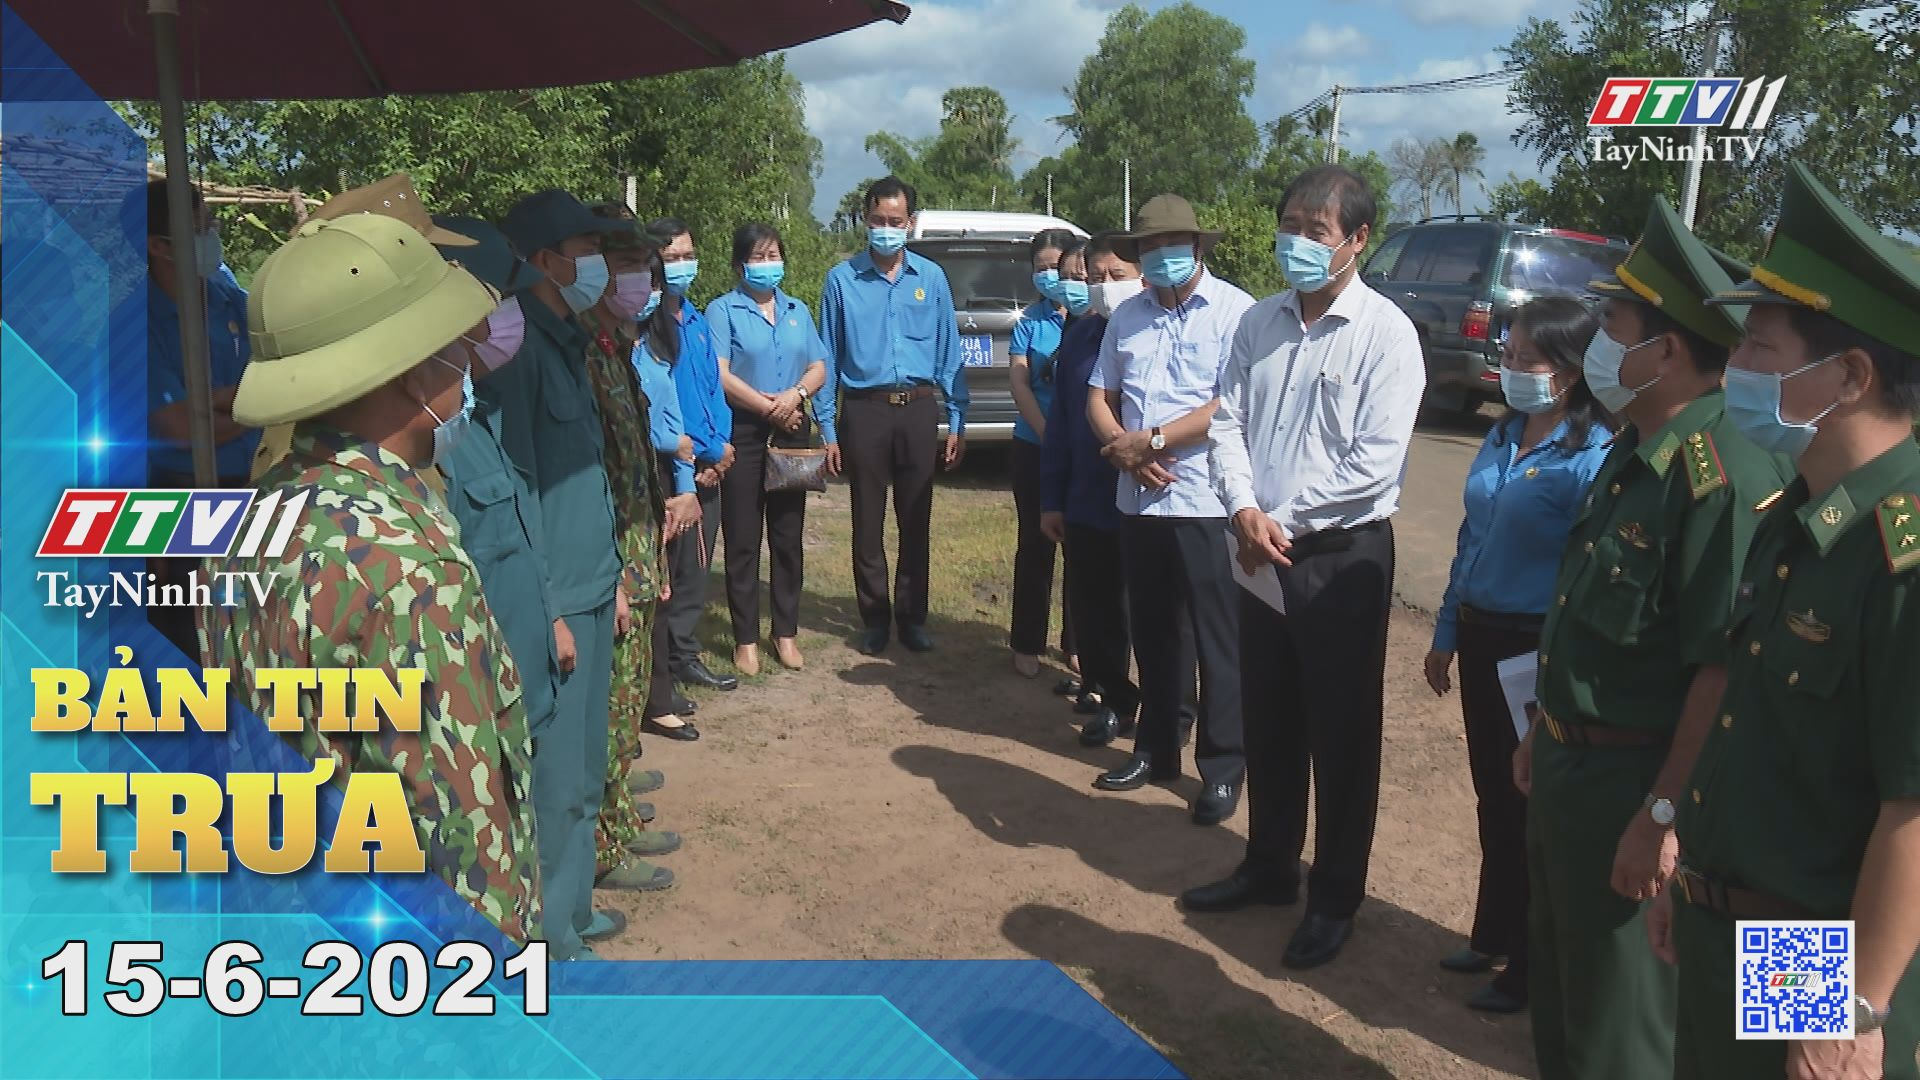 Bản tin trưa 15-6-2021 | Tin tức hôm nay | TayNinhTV